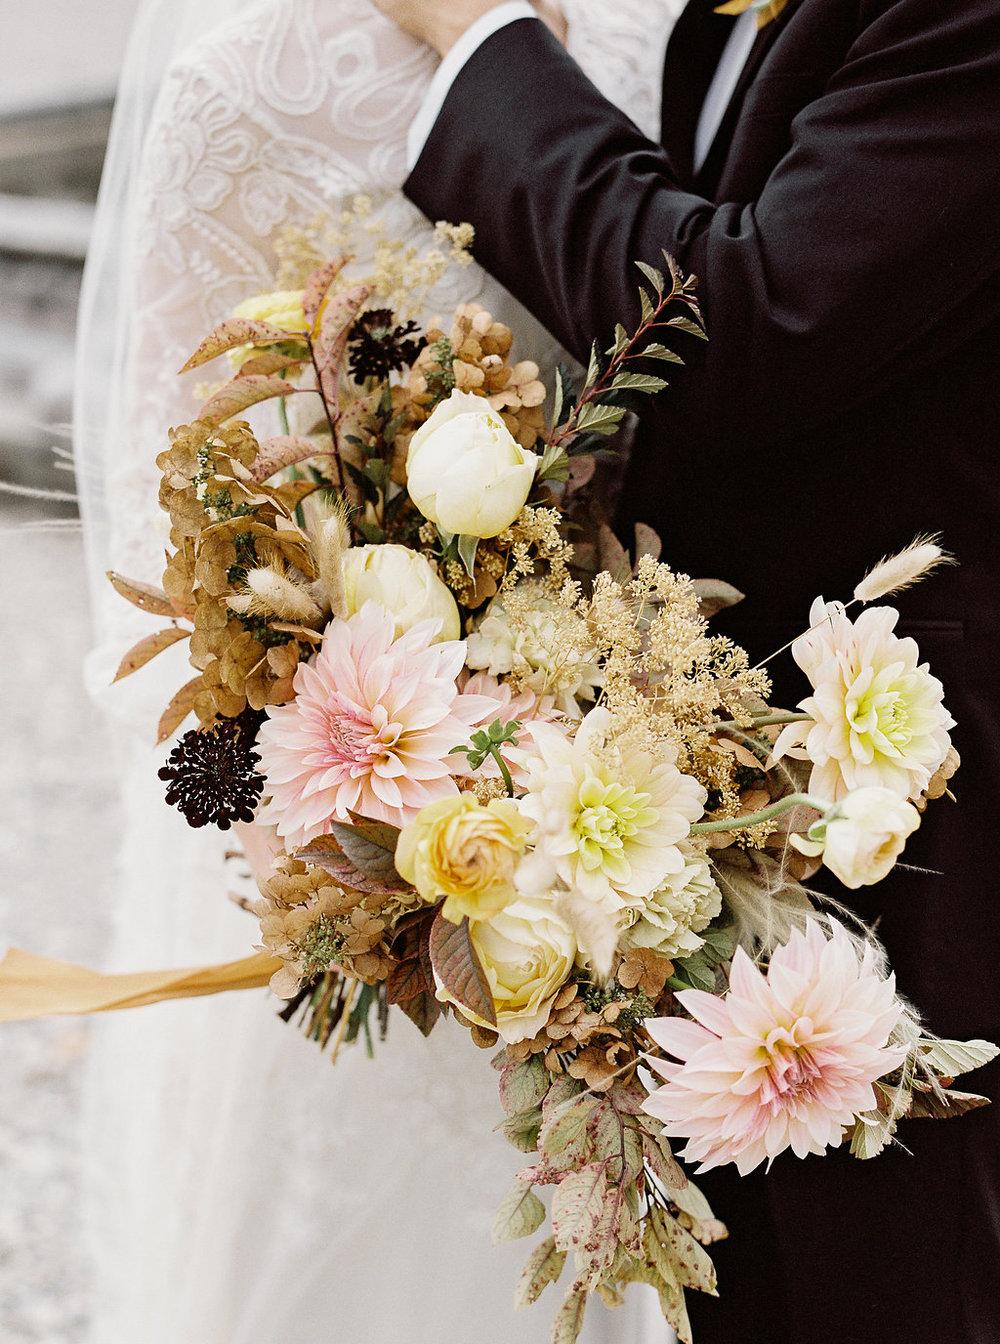 fall-wedding-Jenny-haas-Samantha-joy-events-laurel-court-cincinnati-wedding-bouquet